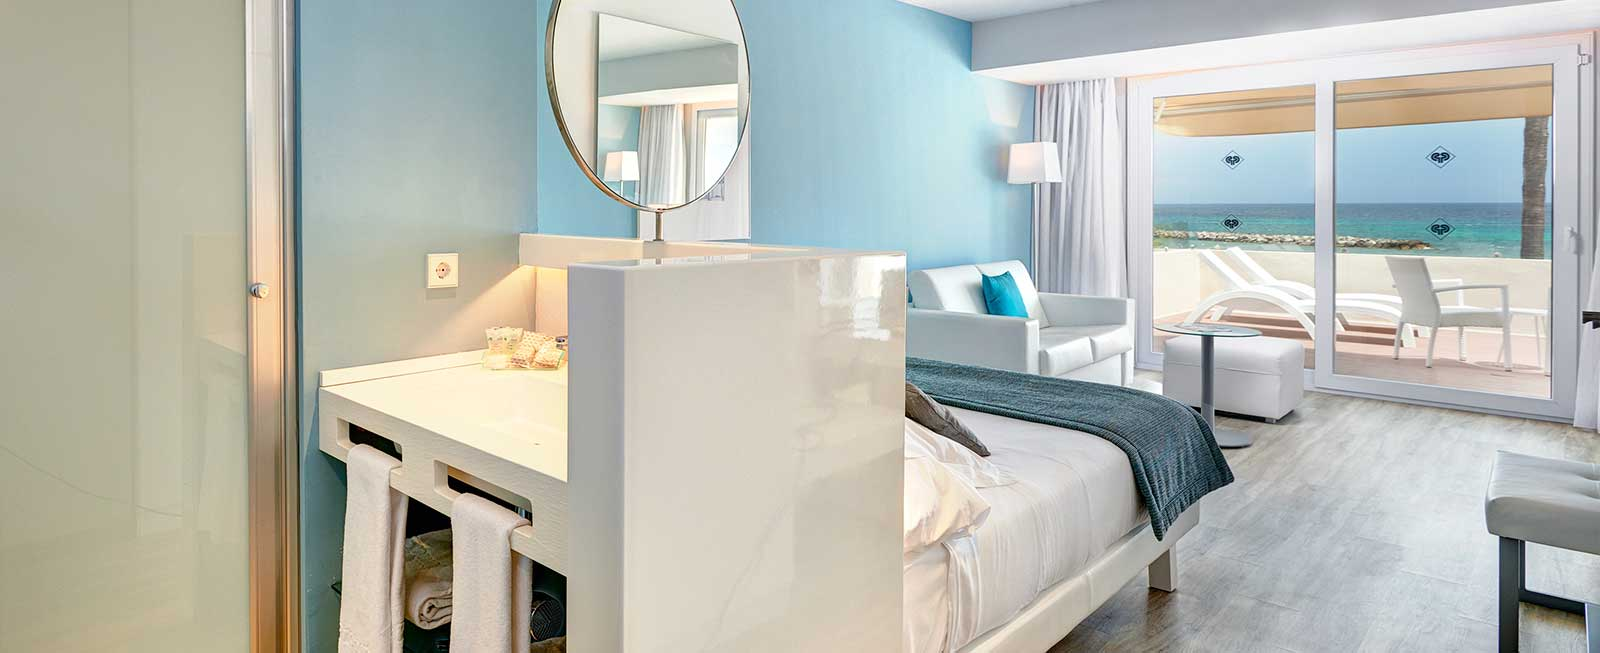 Hotel Cala Bona Twin Sea View Room